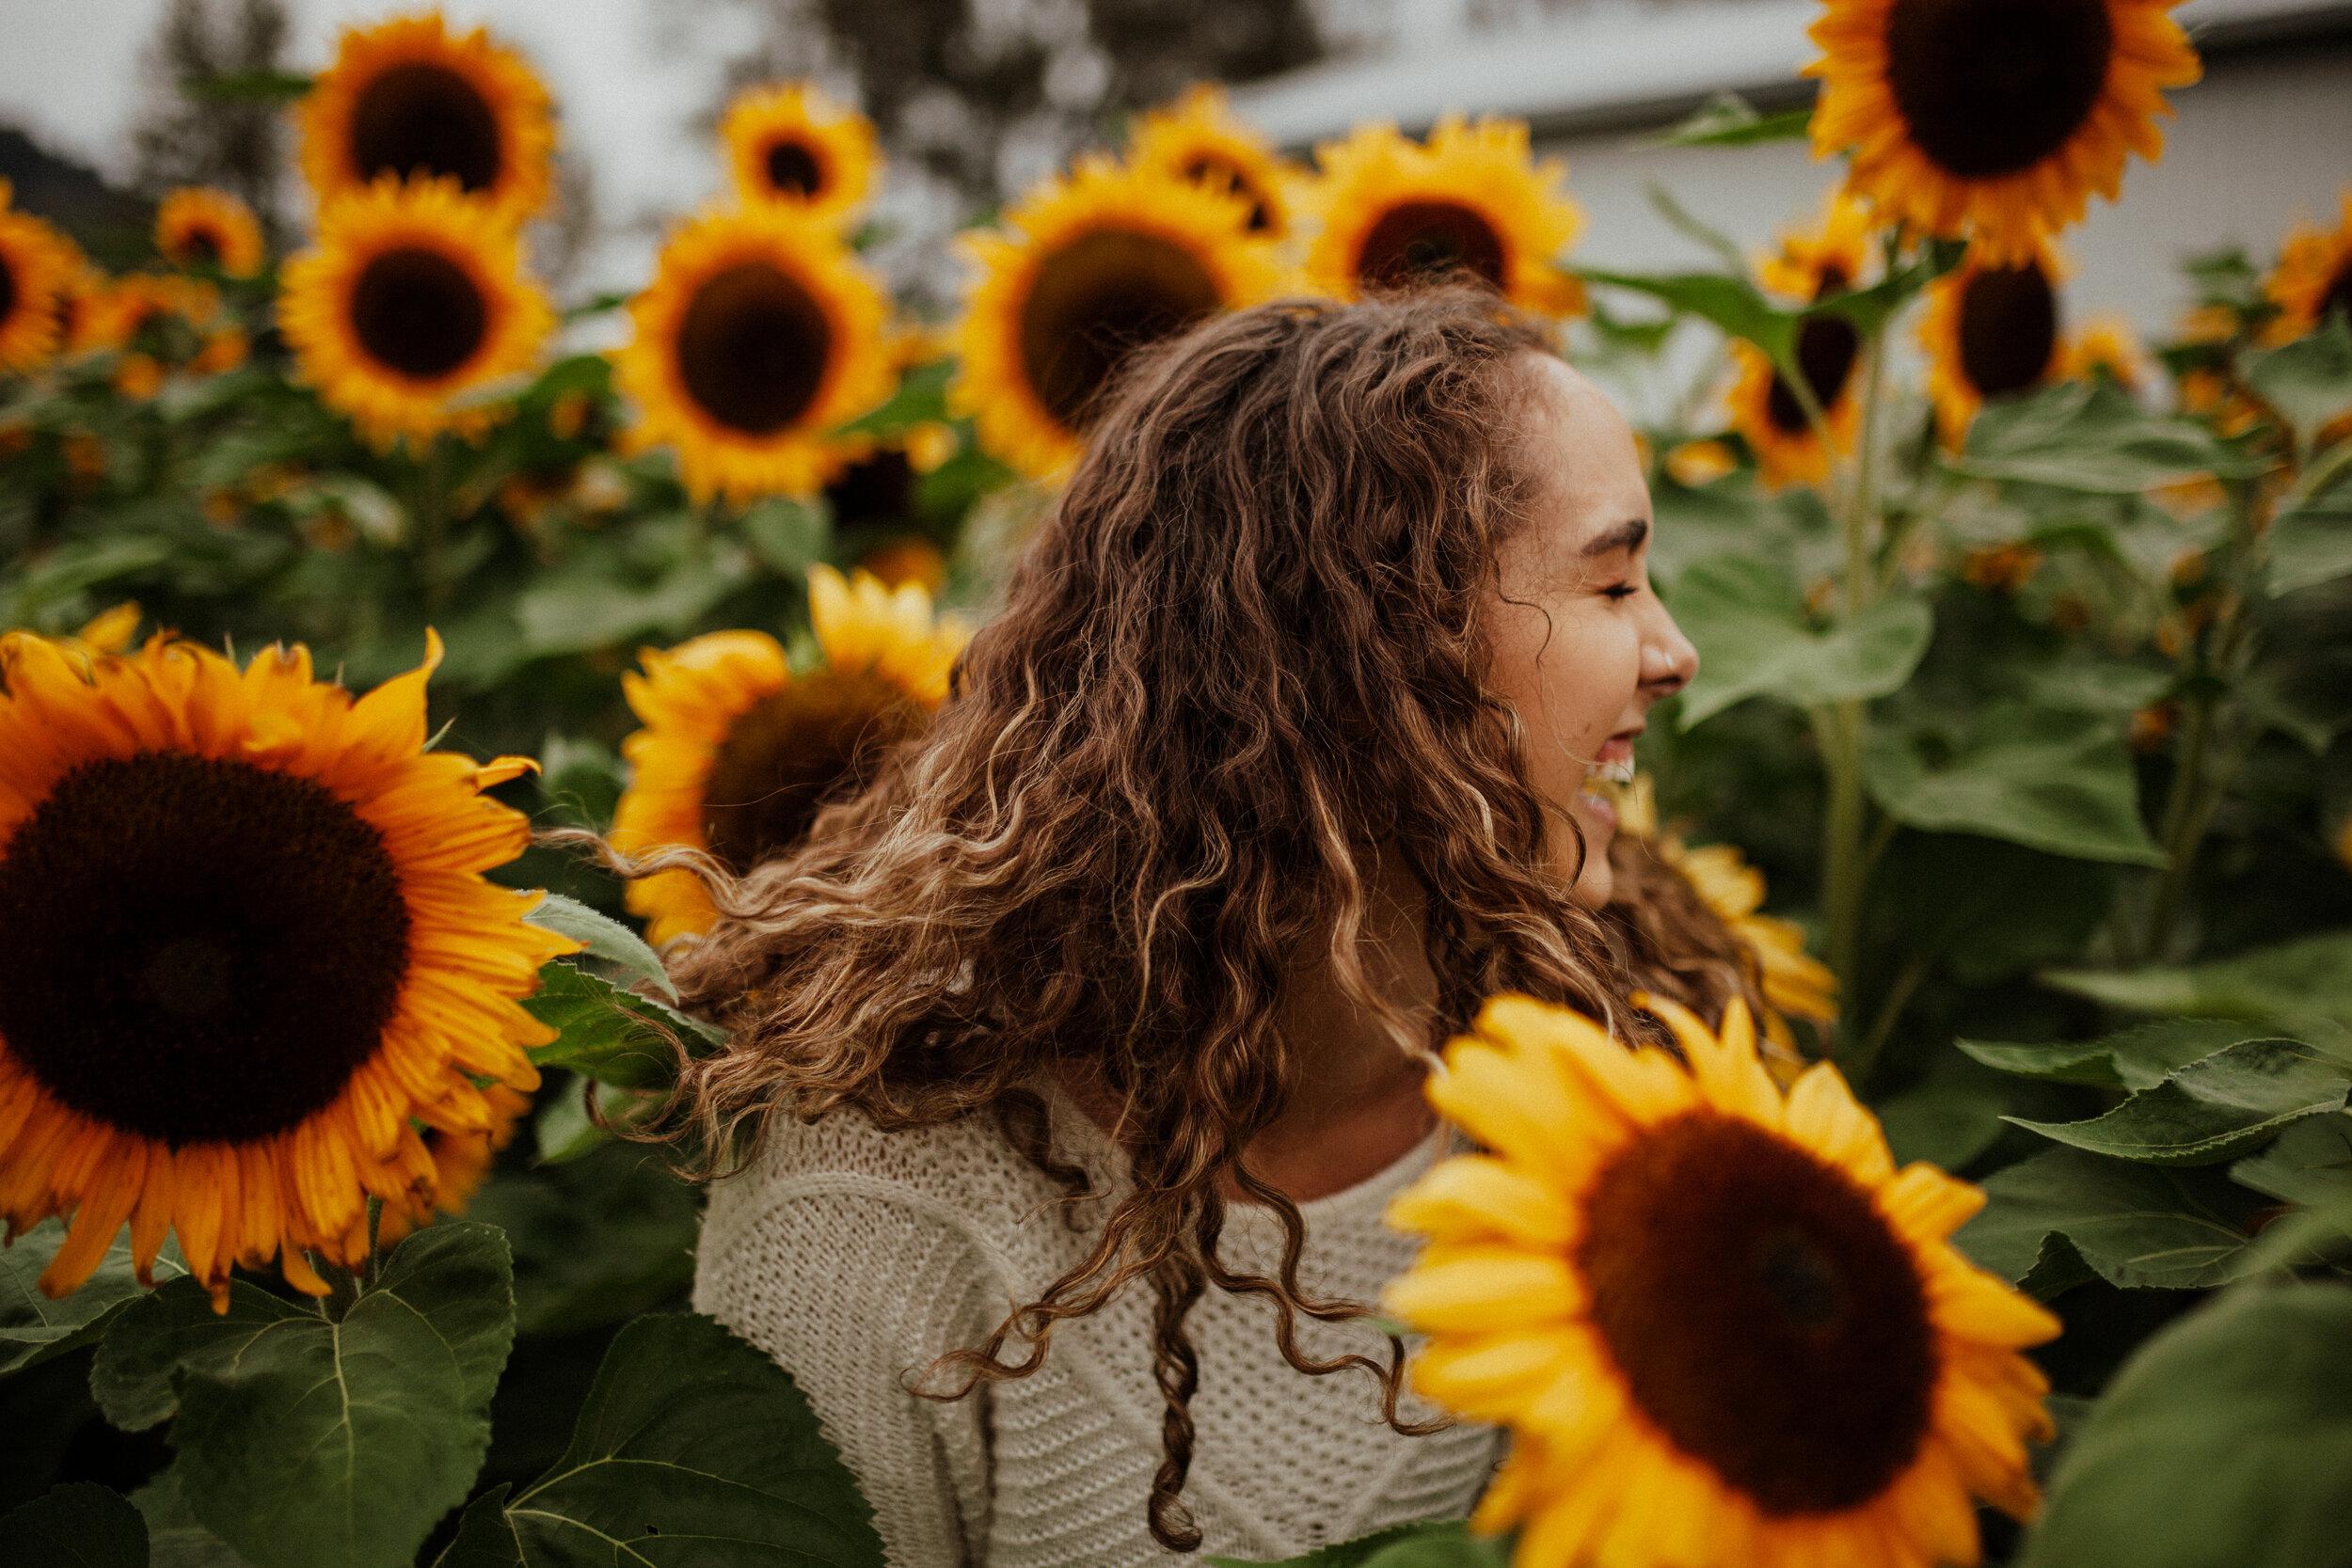 SunflowerFestival-23.jpg